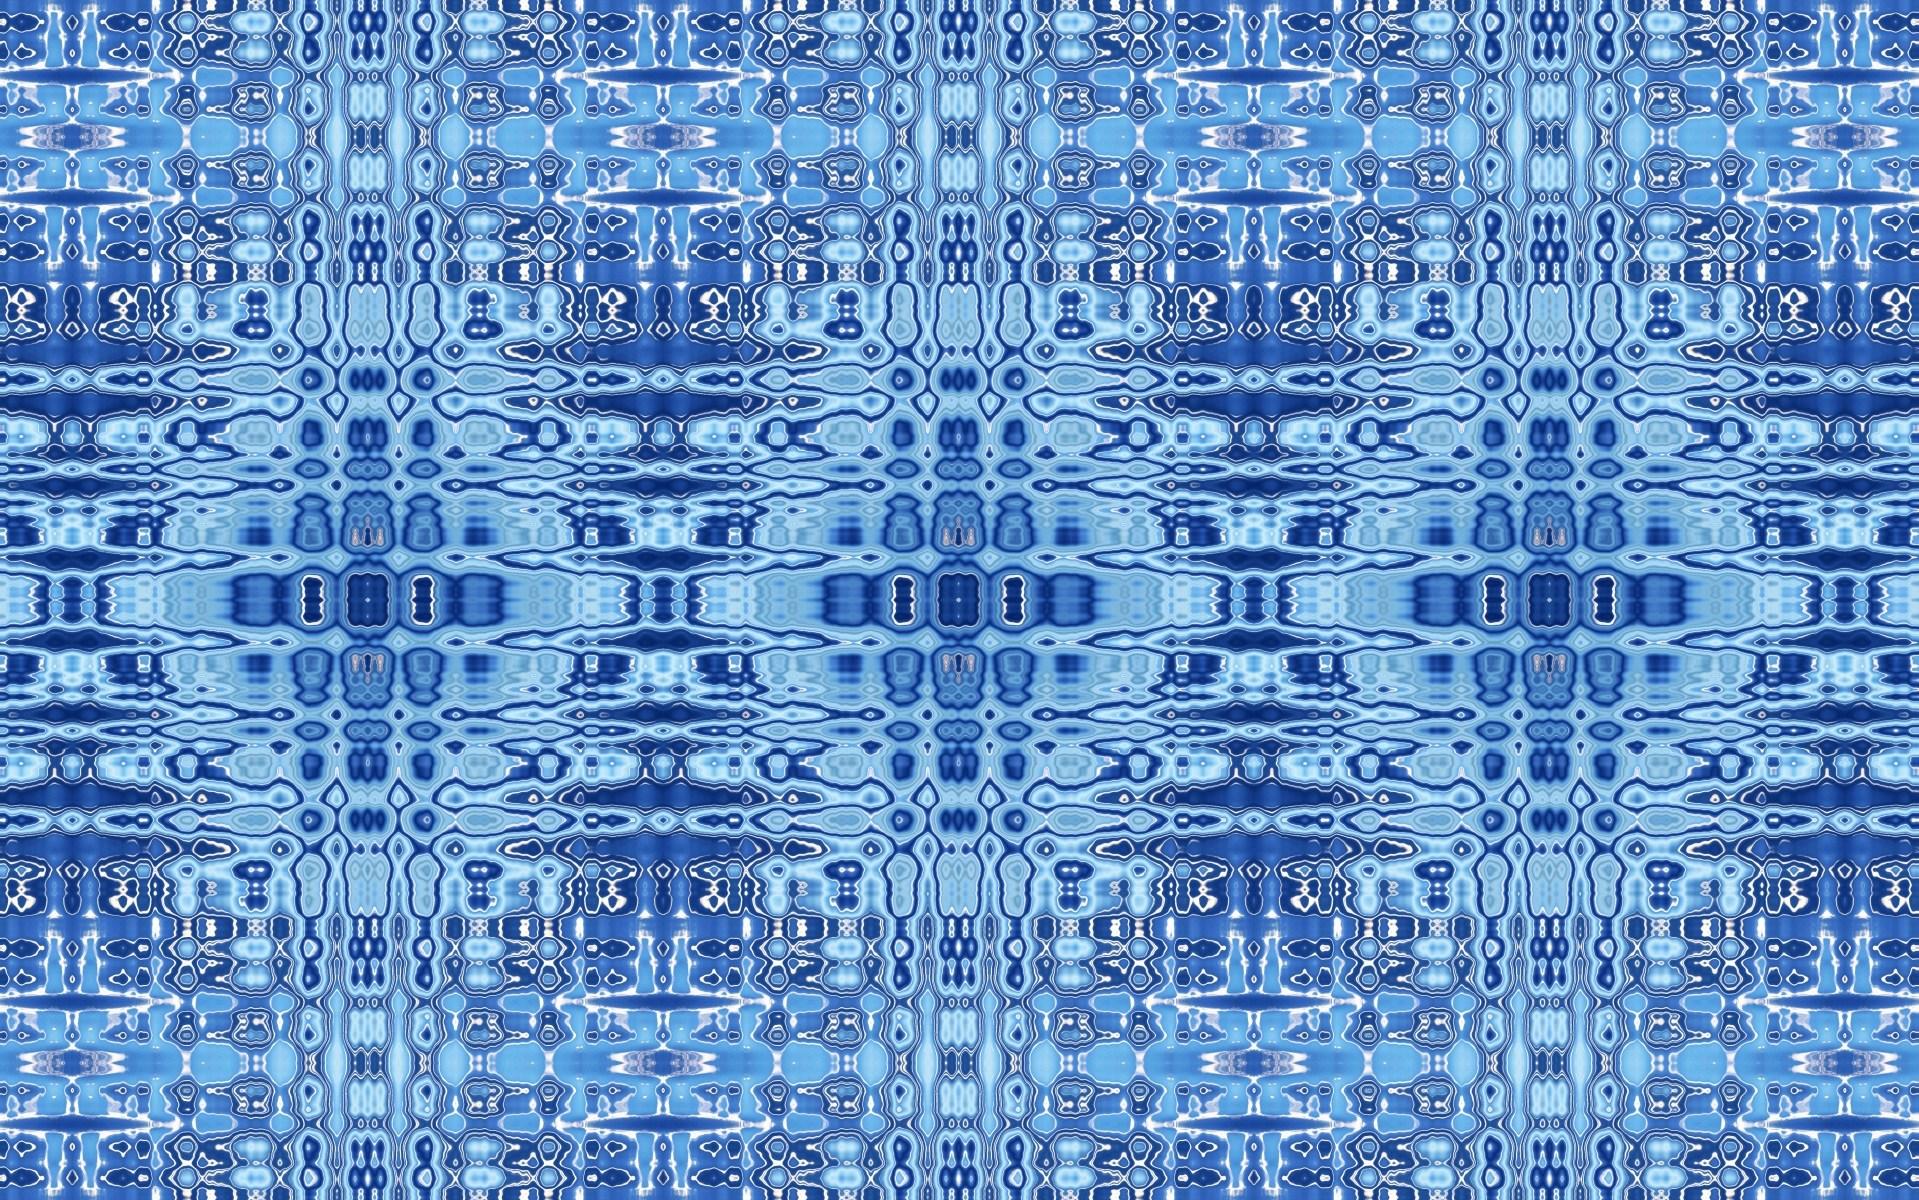 Blue ripple pattern